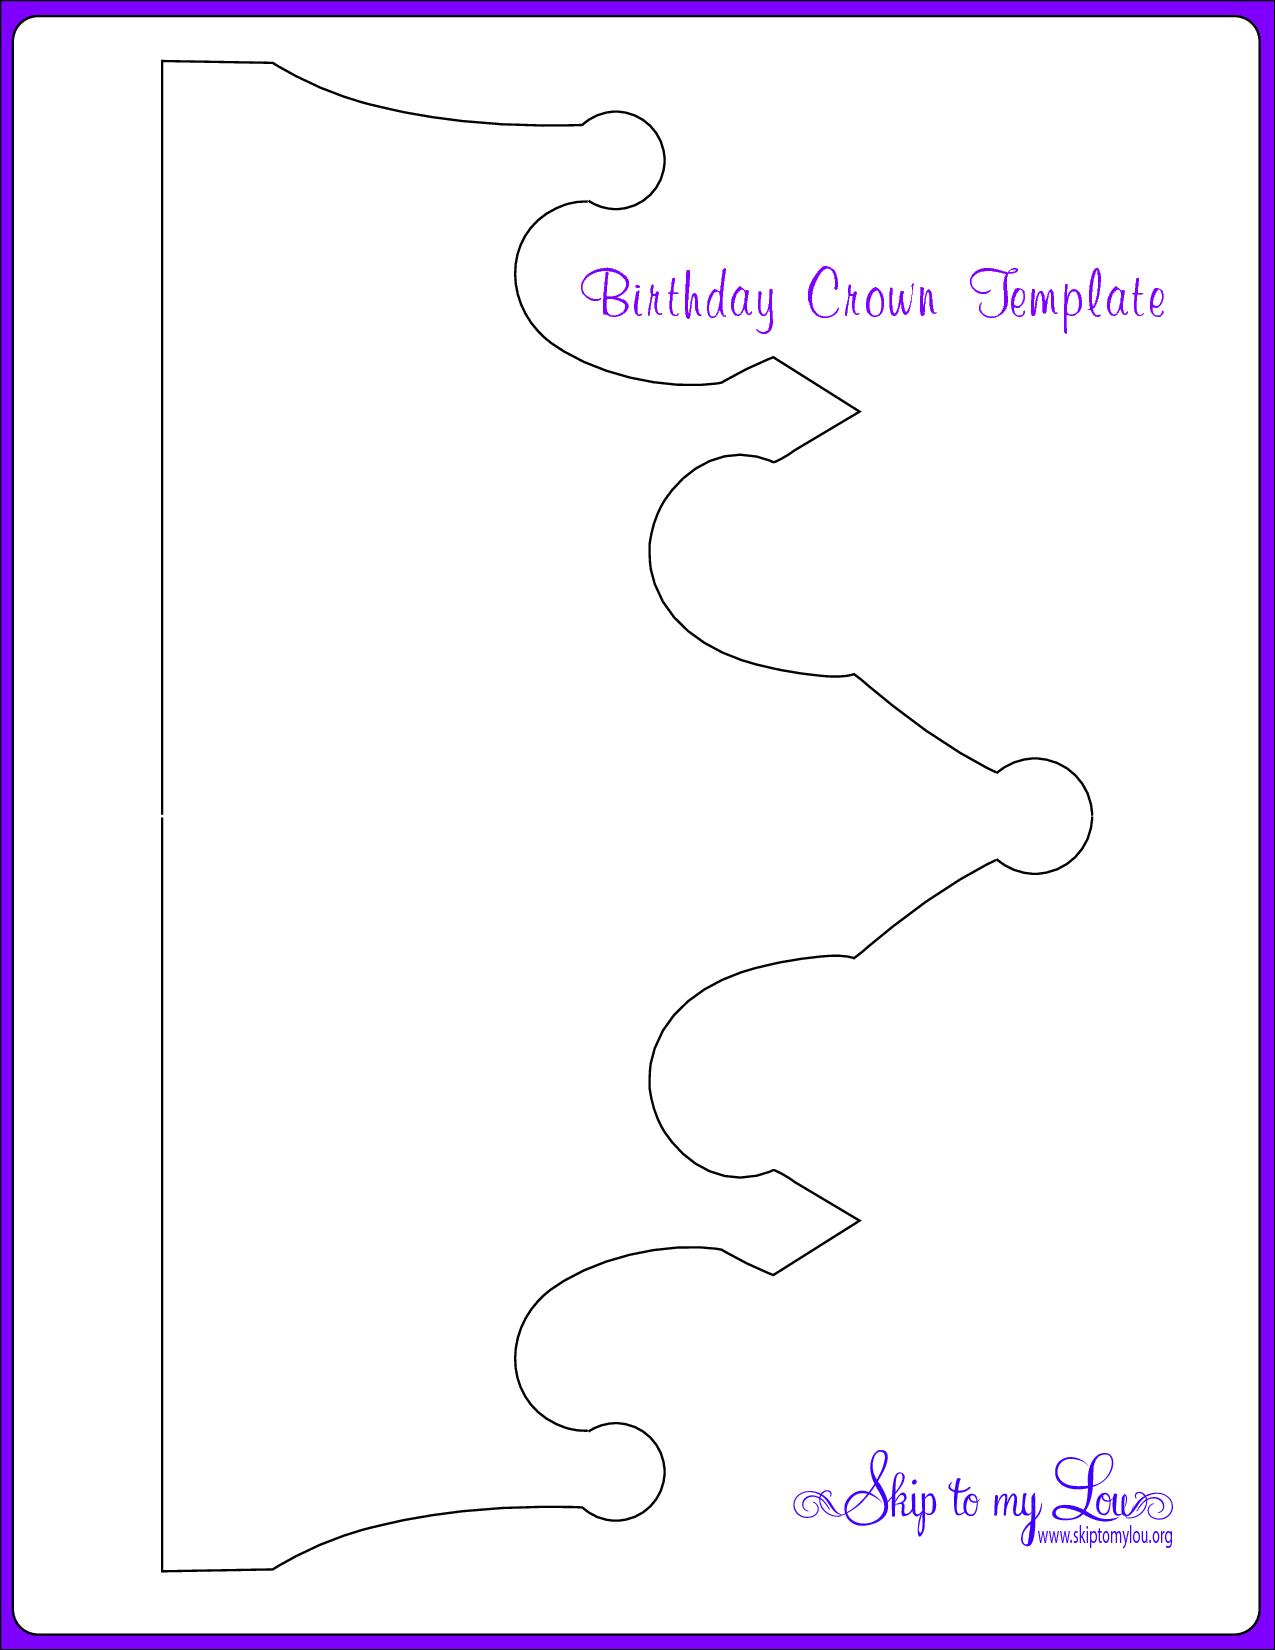 Paper Crowns Templates - PDF.pdf Download legal documents Paper ...